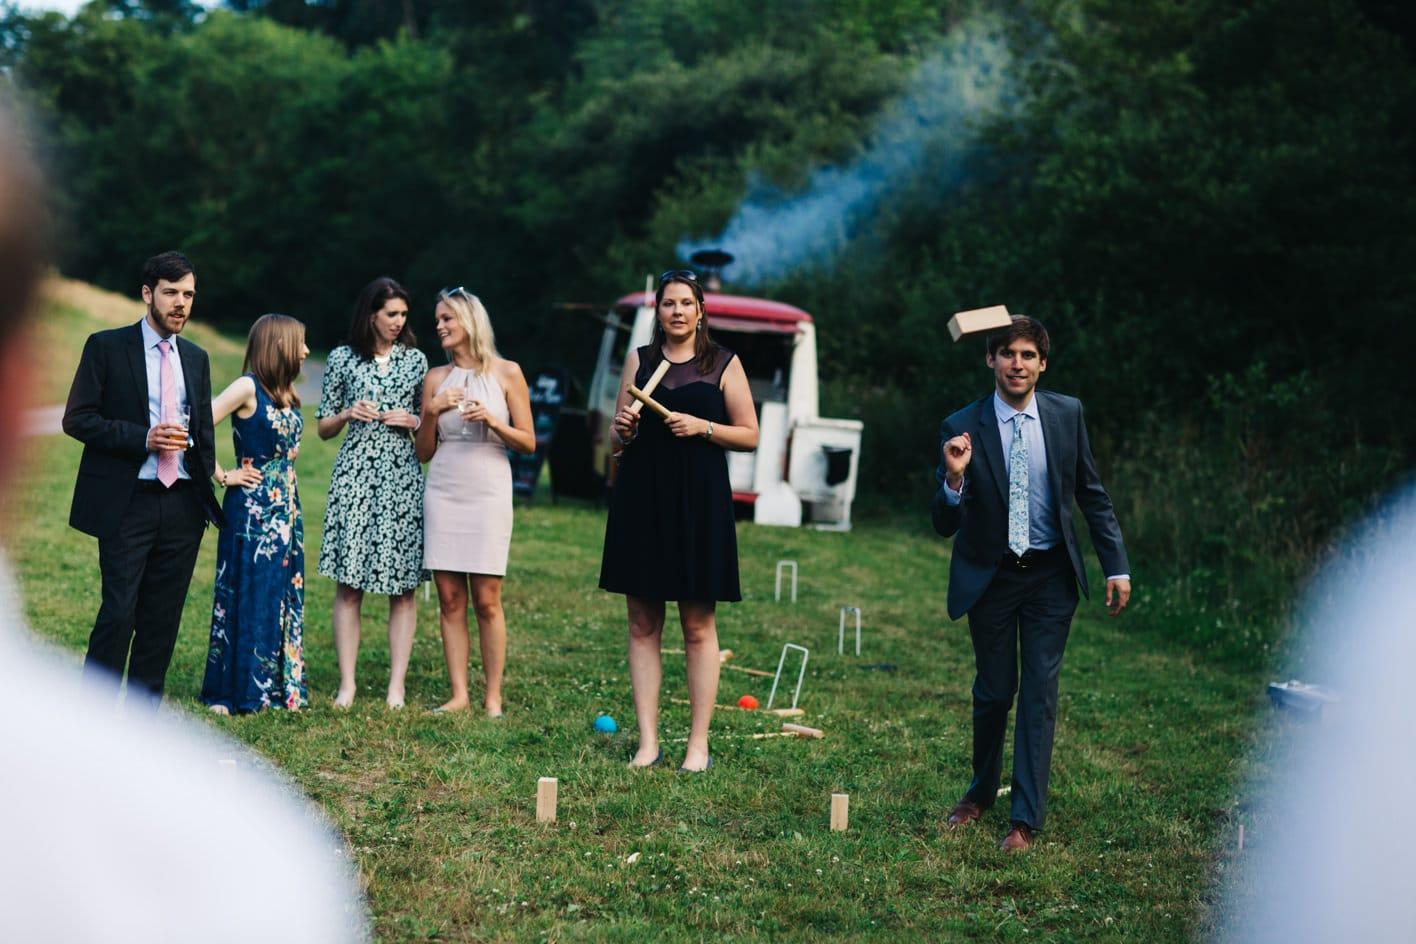 outdoor wedding lawn games